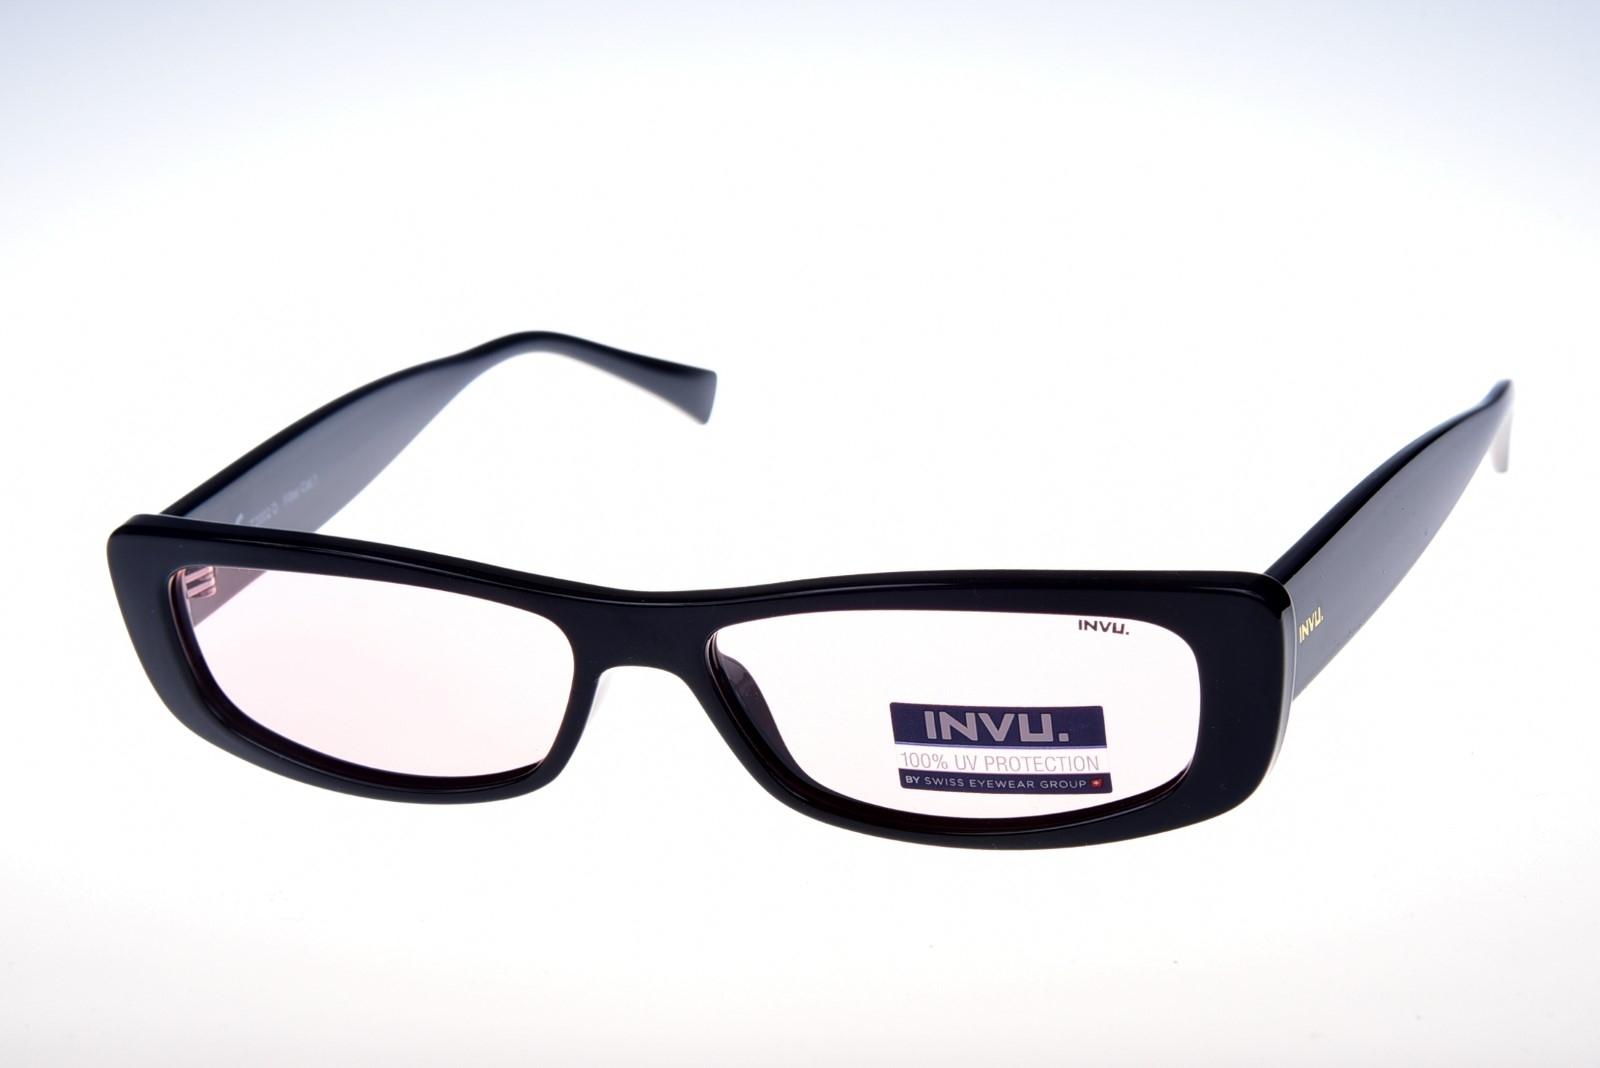 INVU. Trend T2002D - Dámske slnečné okuliare